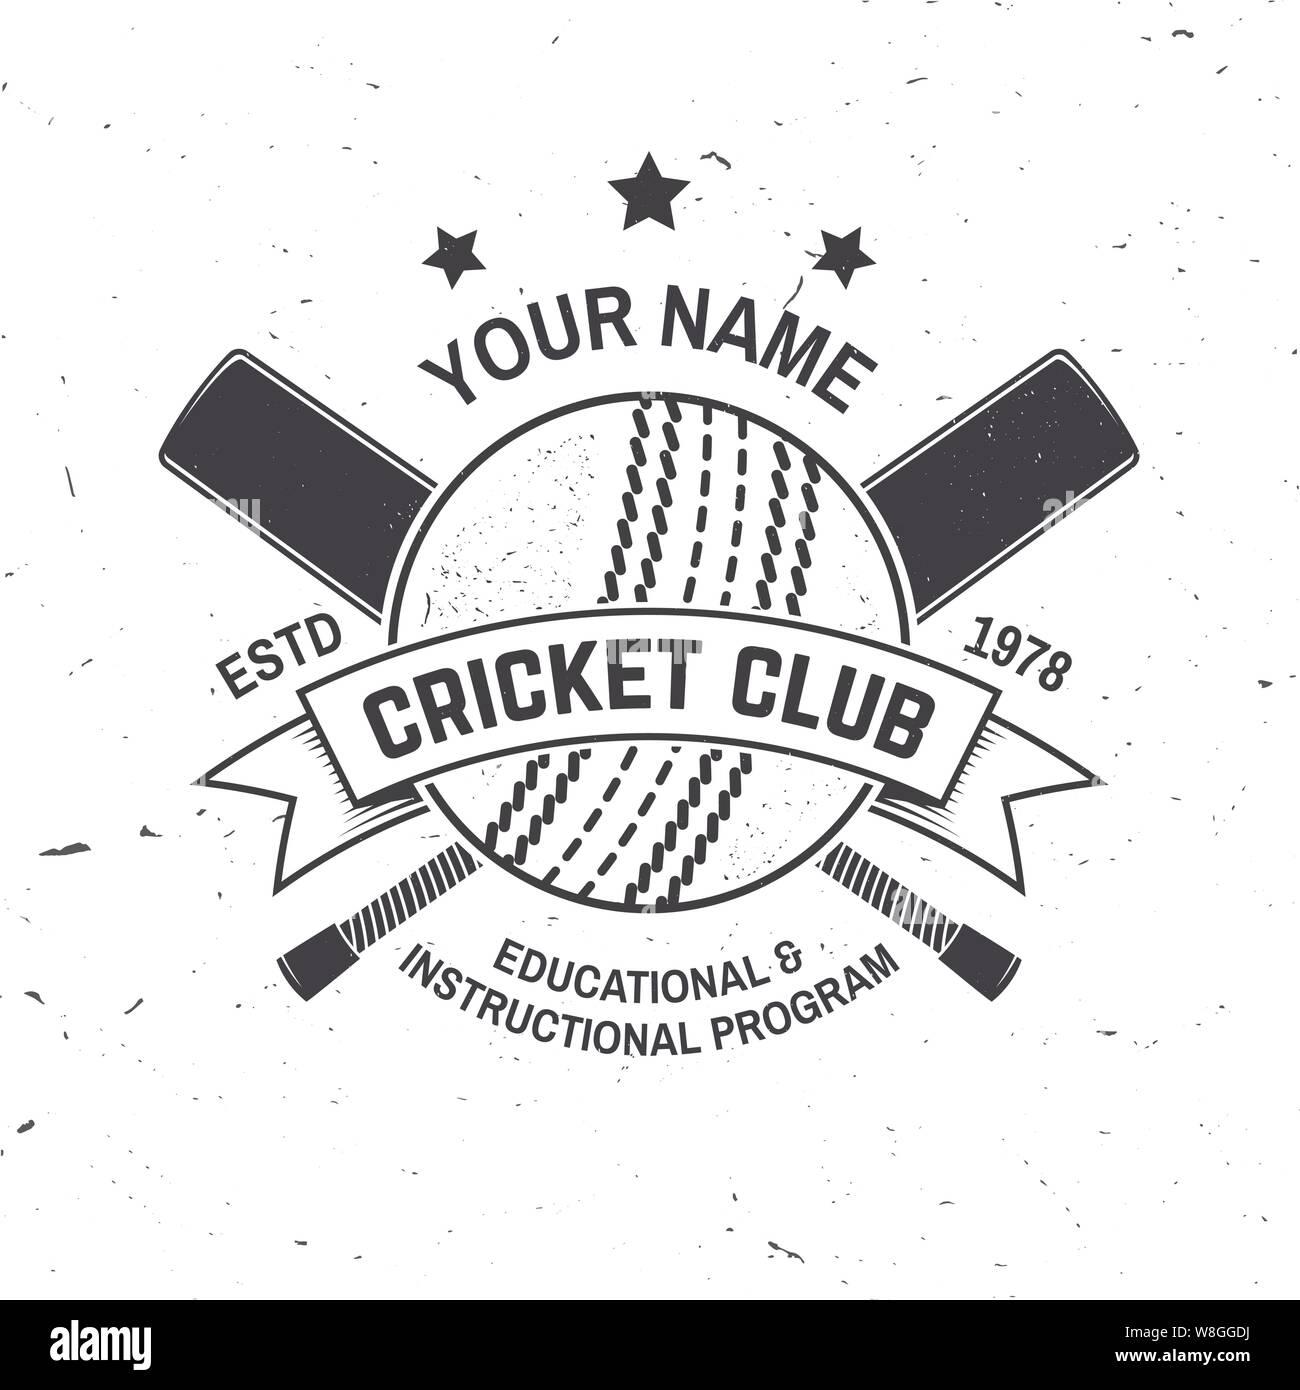 Cricket Tournament Stock Photos & Cricket Tournament Stock